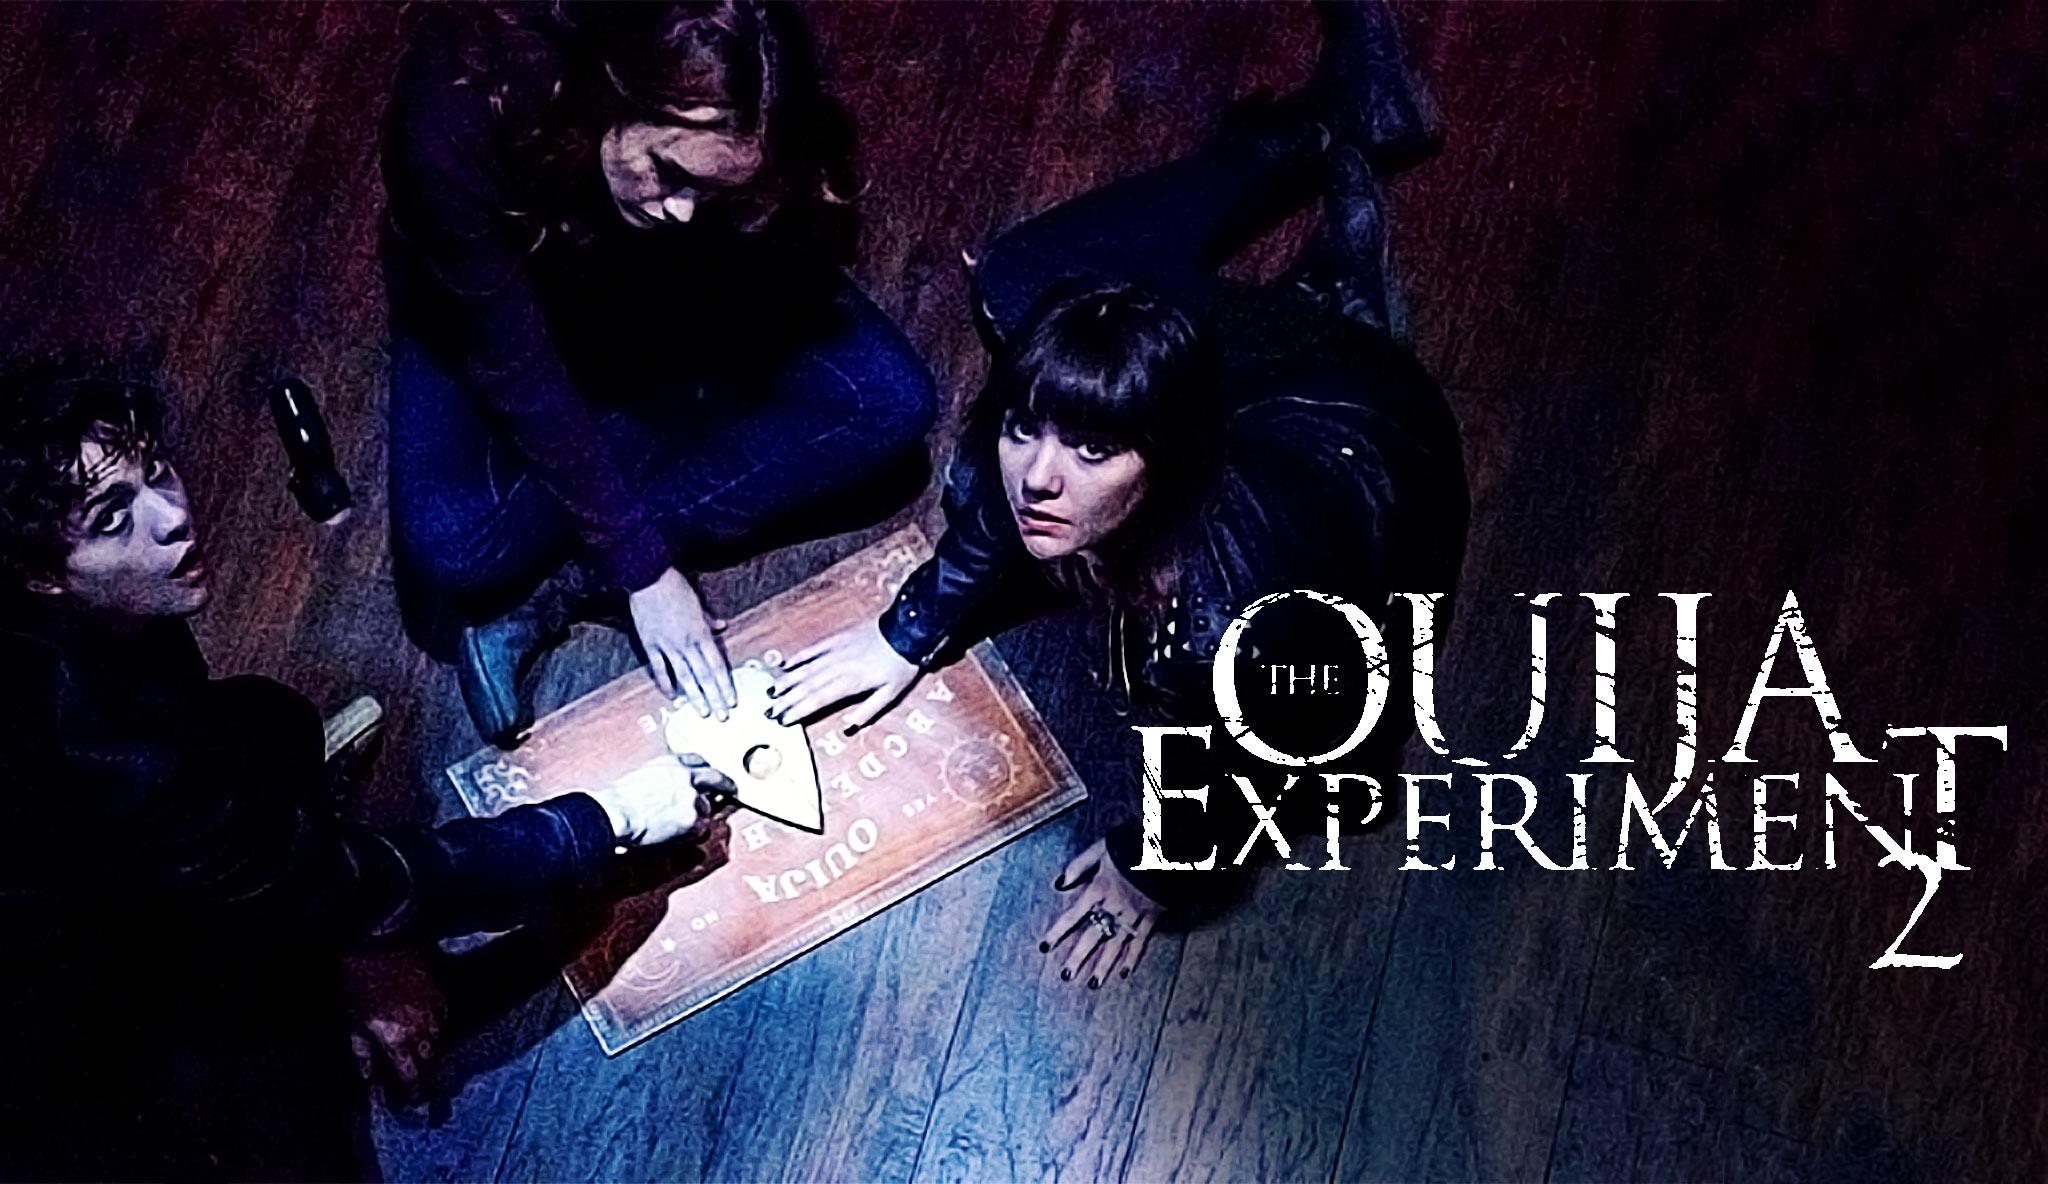 das-ouija-experiment-2-theatre-of-death\header.jpg